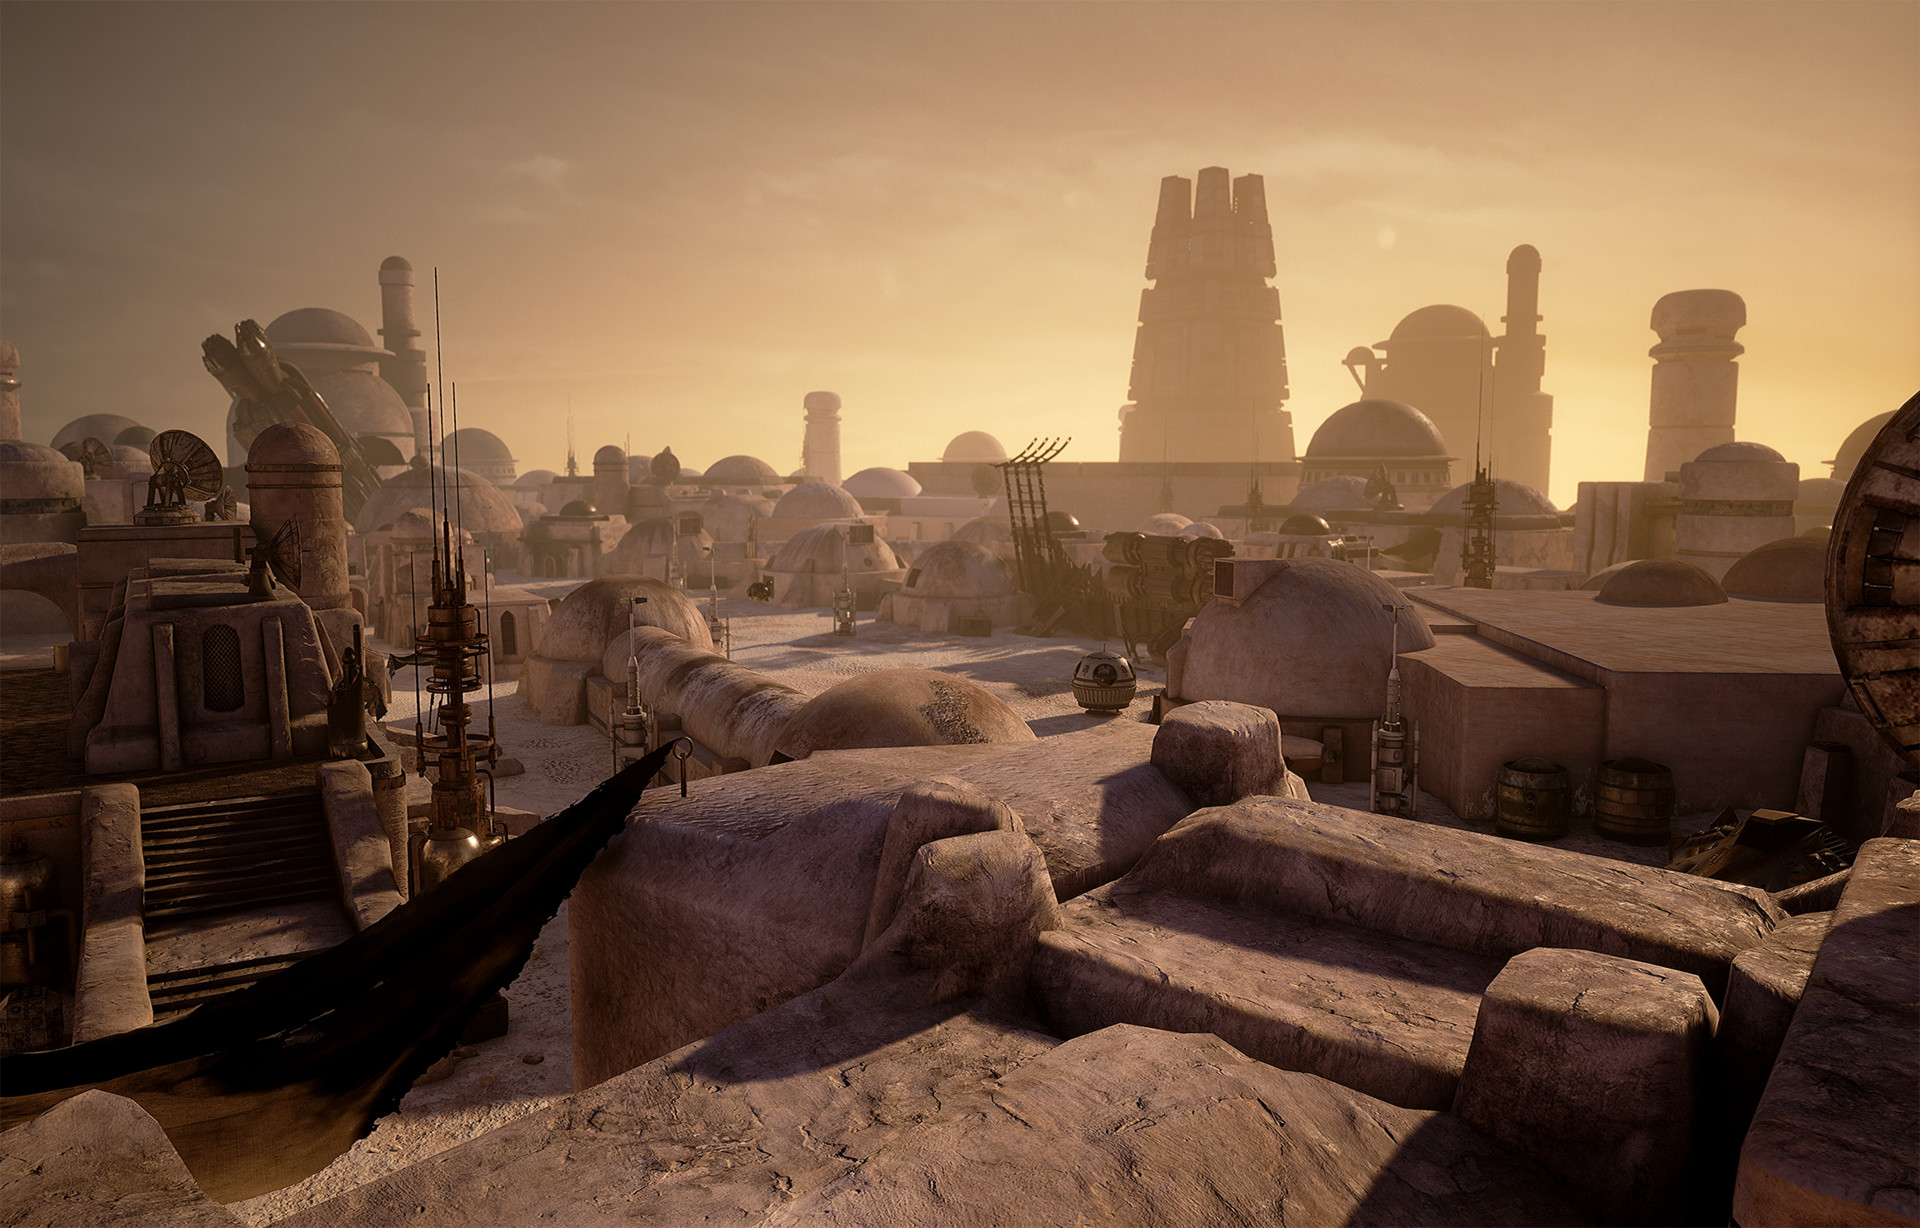 Terry Hess - Star Wars Tatooine Mos Eisley